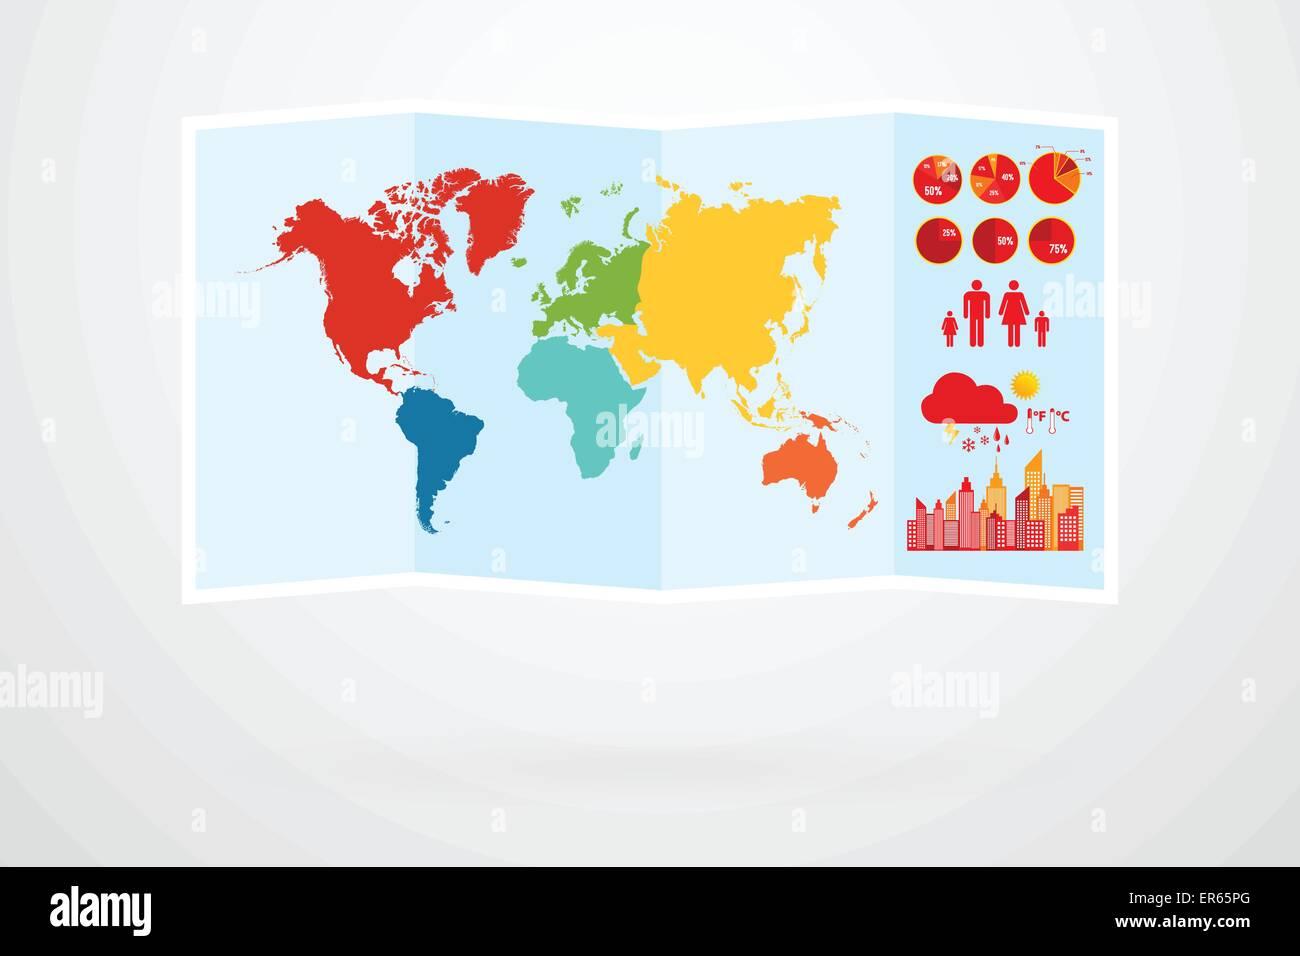 Map pin australia stock photos map pin australia stock images world map vector infographic stock image gumiabroncs Images